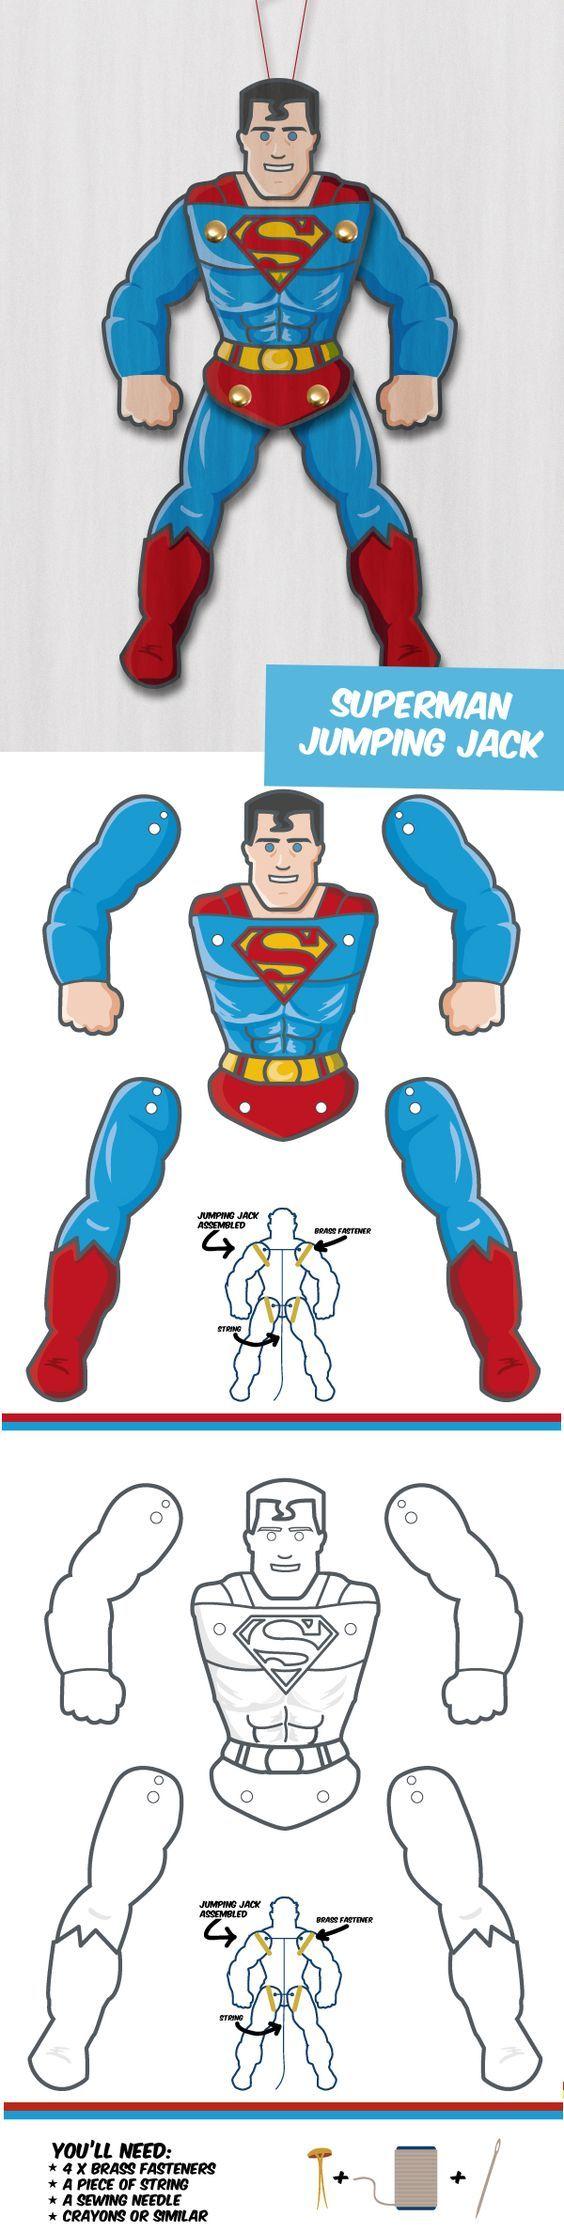 Les Hros Crafty Ness Pinterest Puppet Superhero And Create